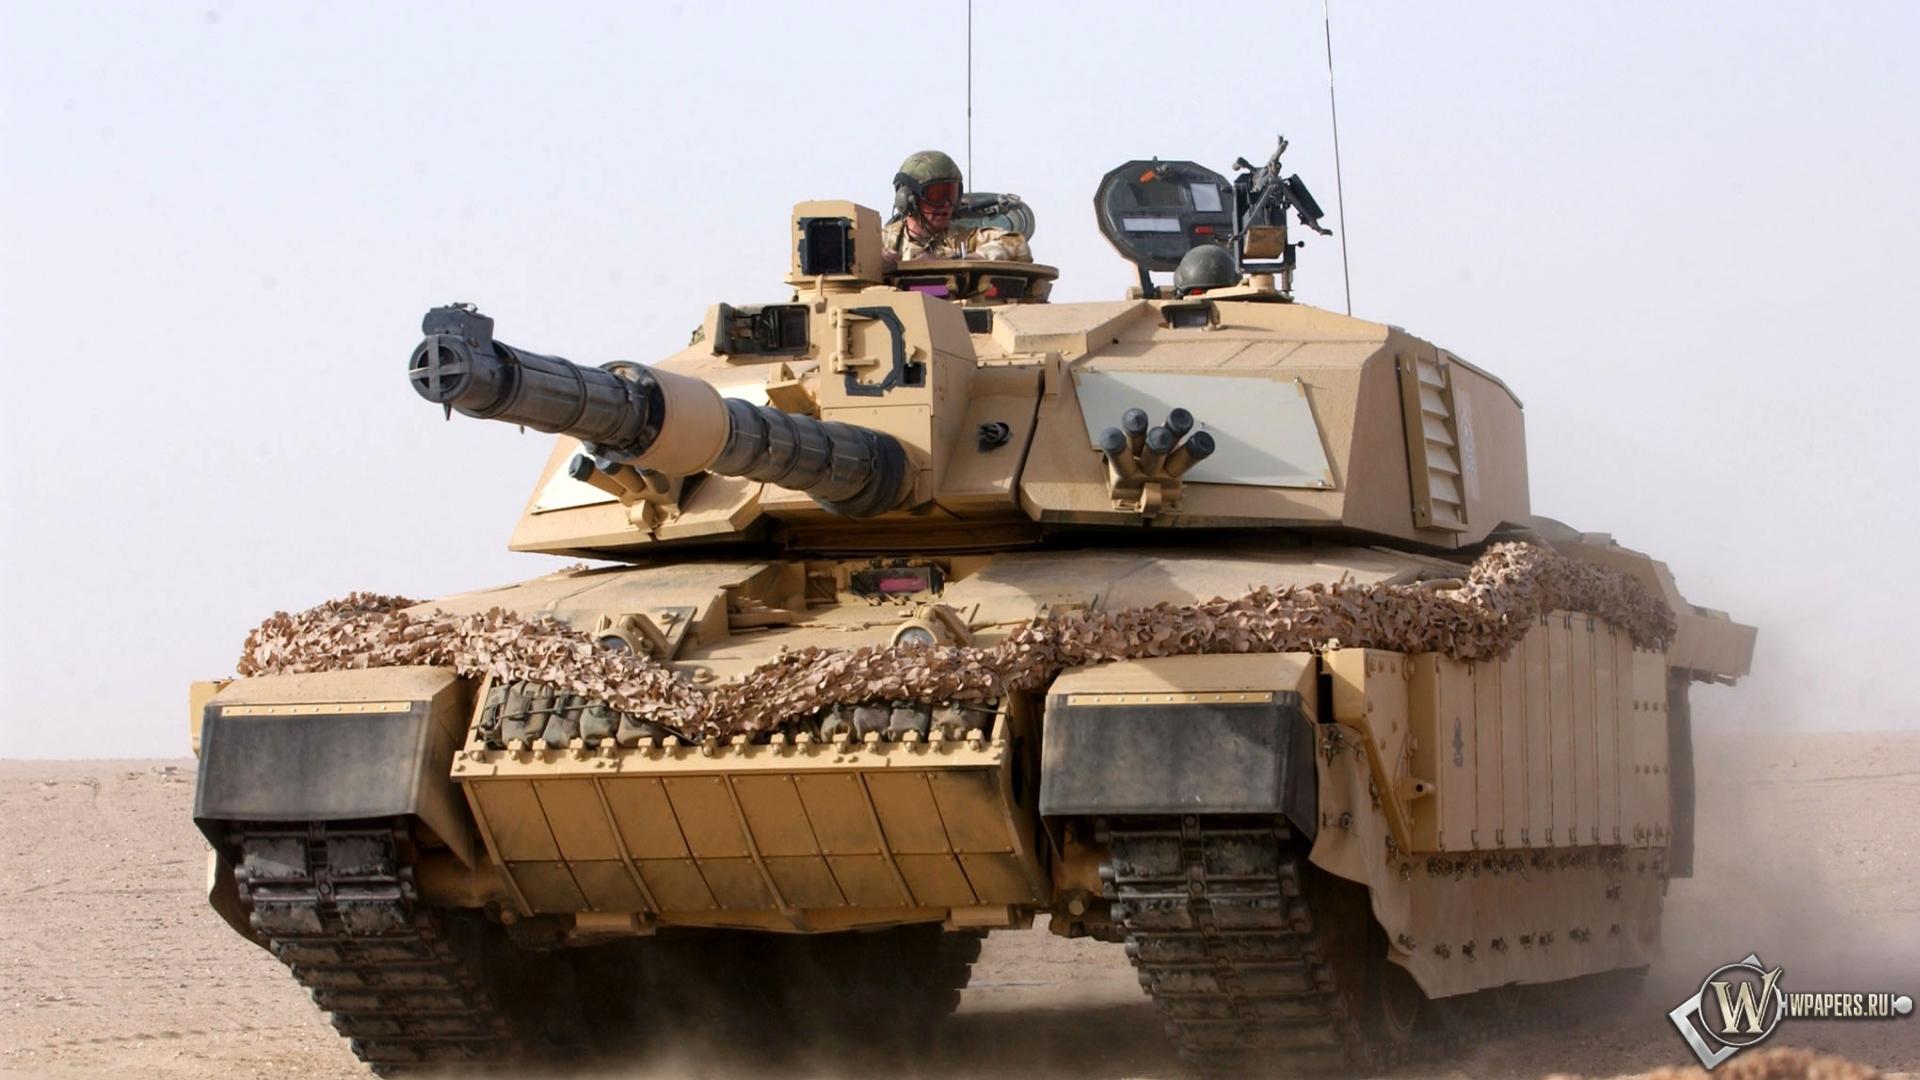 Песок танк жара 1920x1080 картинки